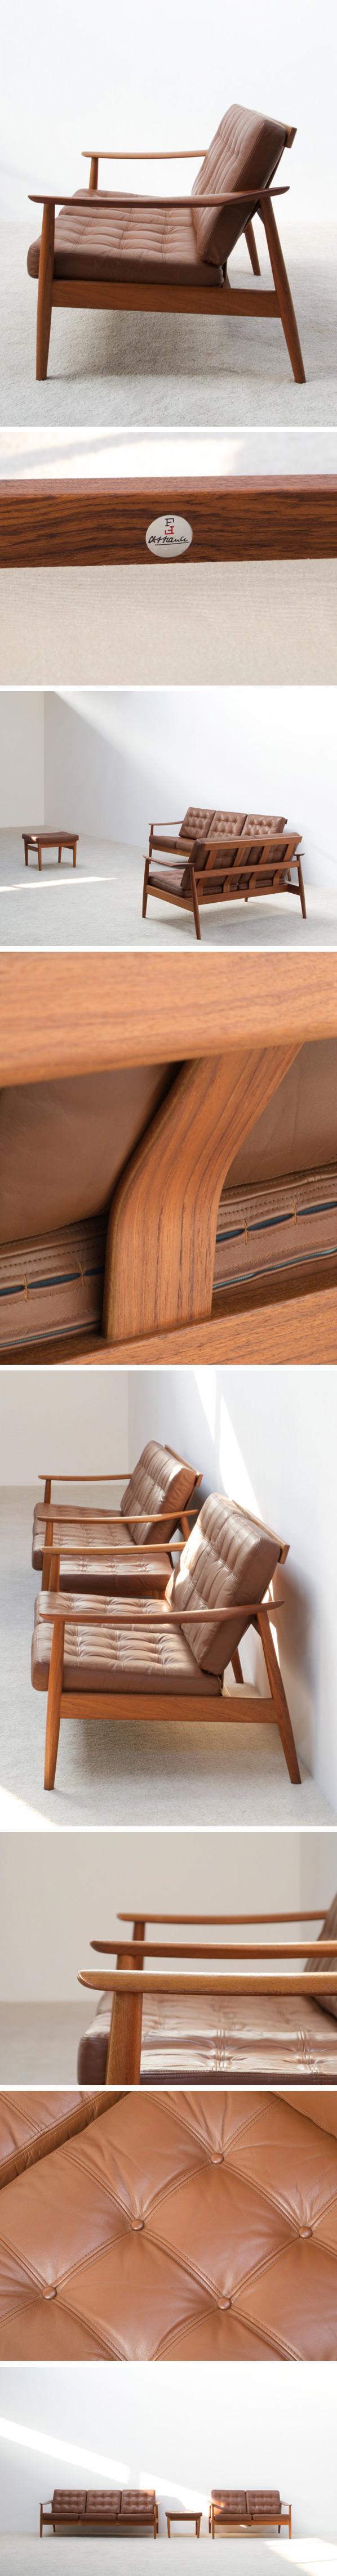 Arne Vodder leather living scape for France and Son Large